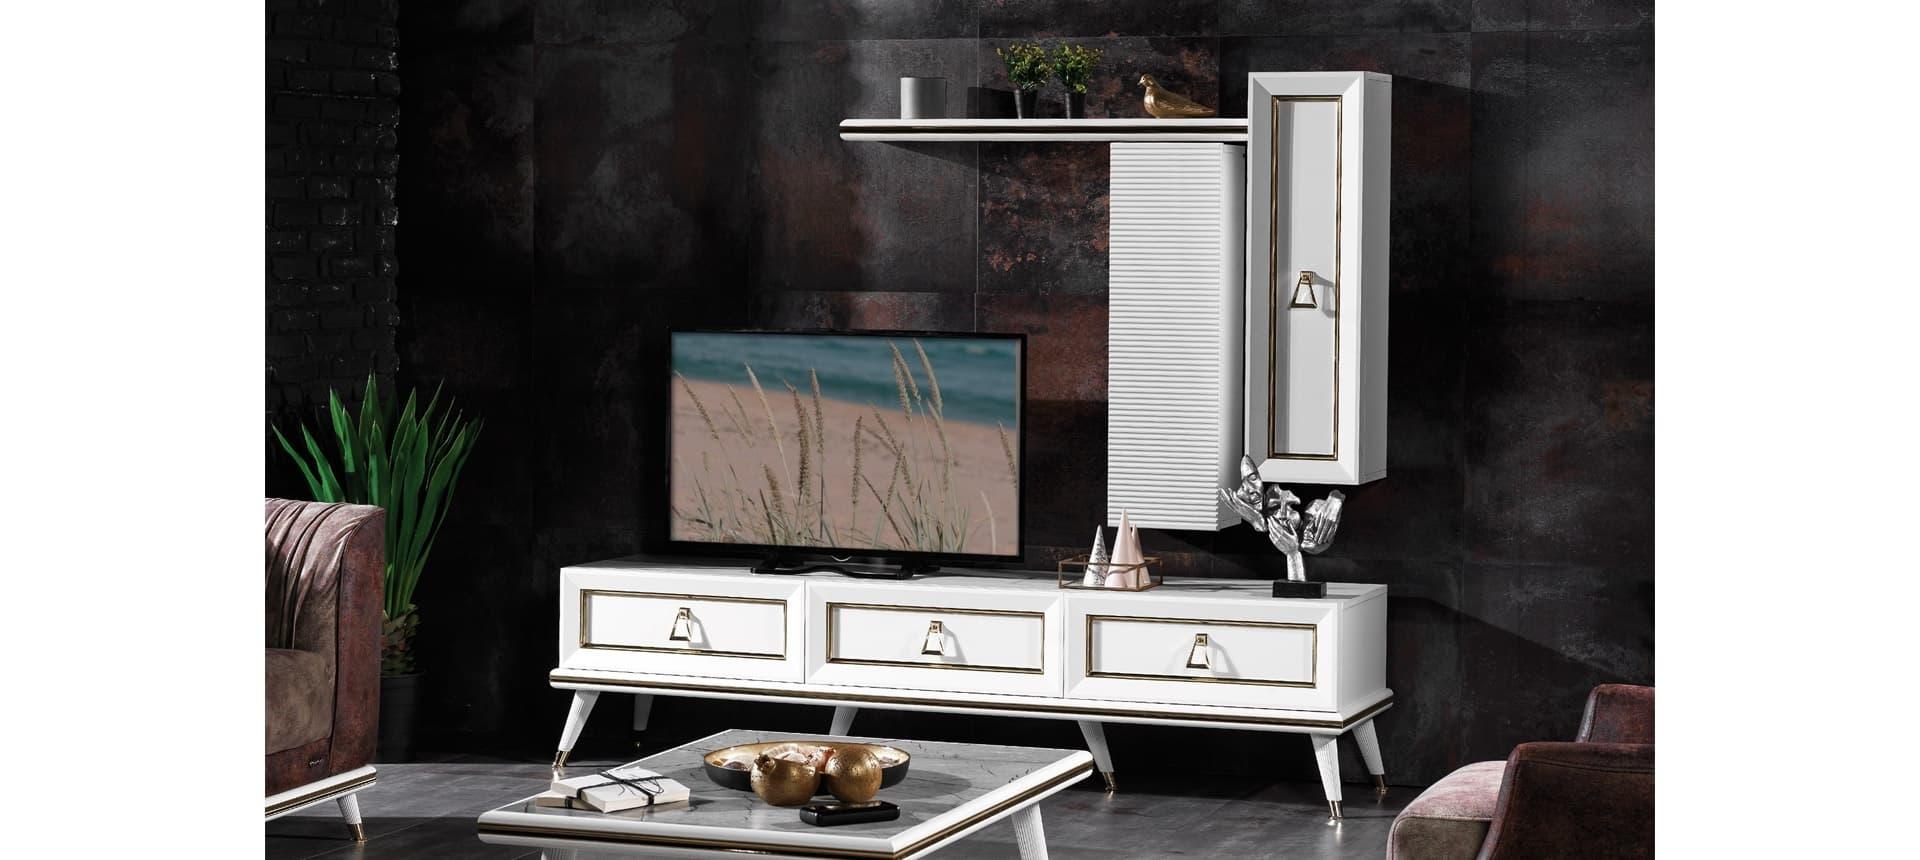 Set de mobila living din pal si metal, 4 piese Toscana Alb / Auriu imagine